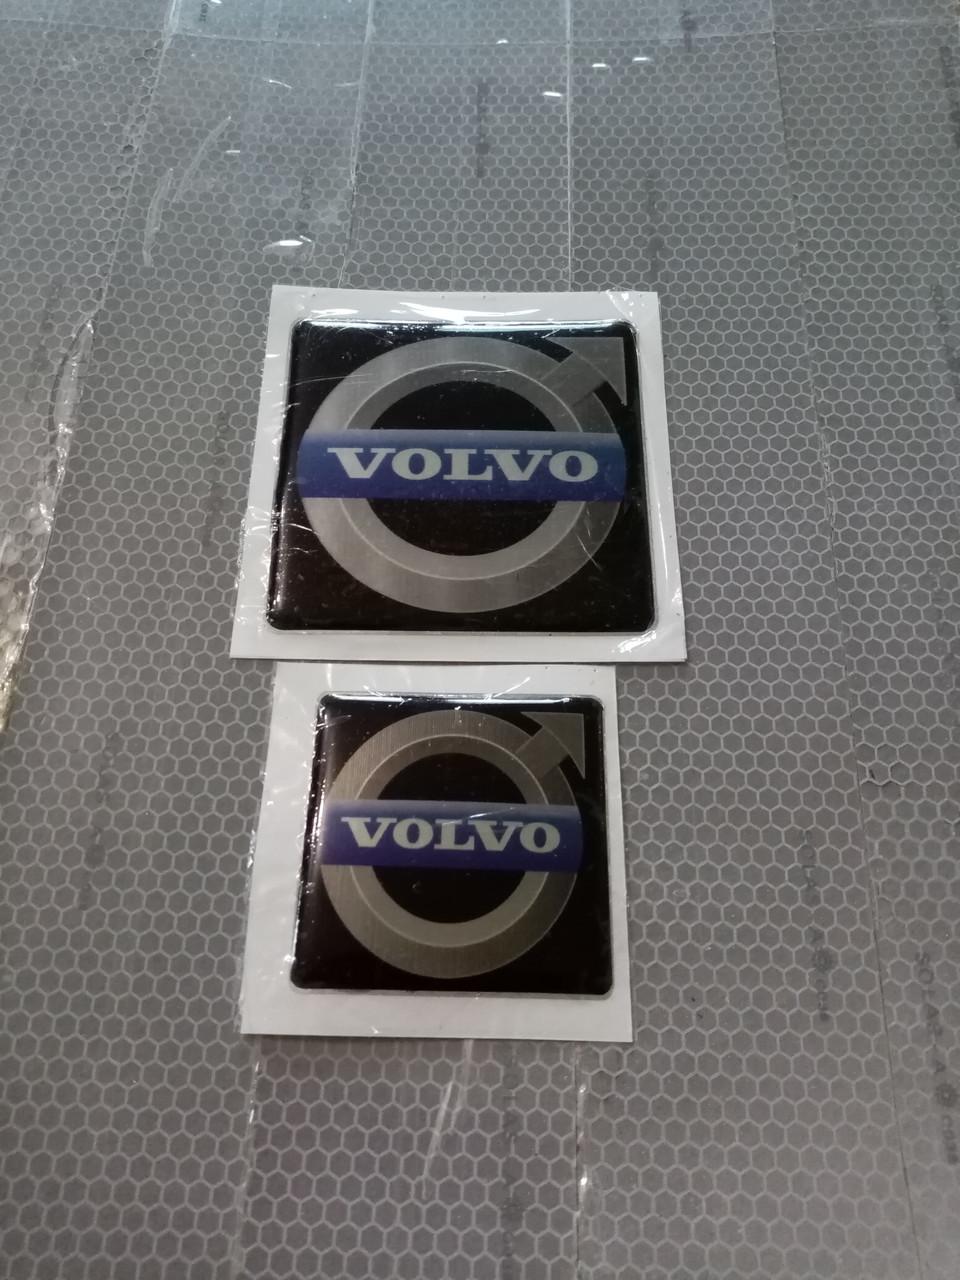 Силиконовые наклейки VOLVO  хром   53х53 мм  и 75х75 мм